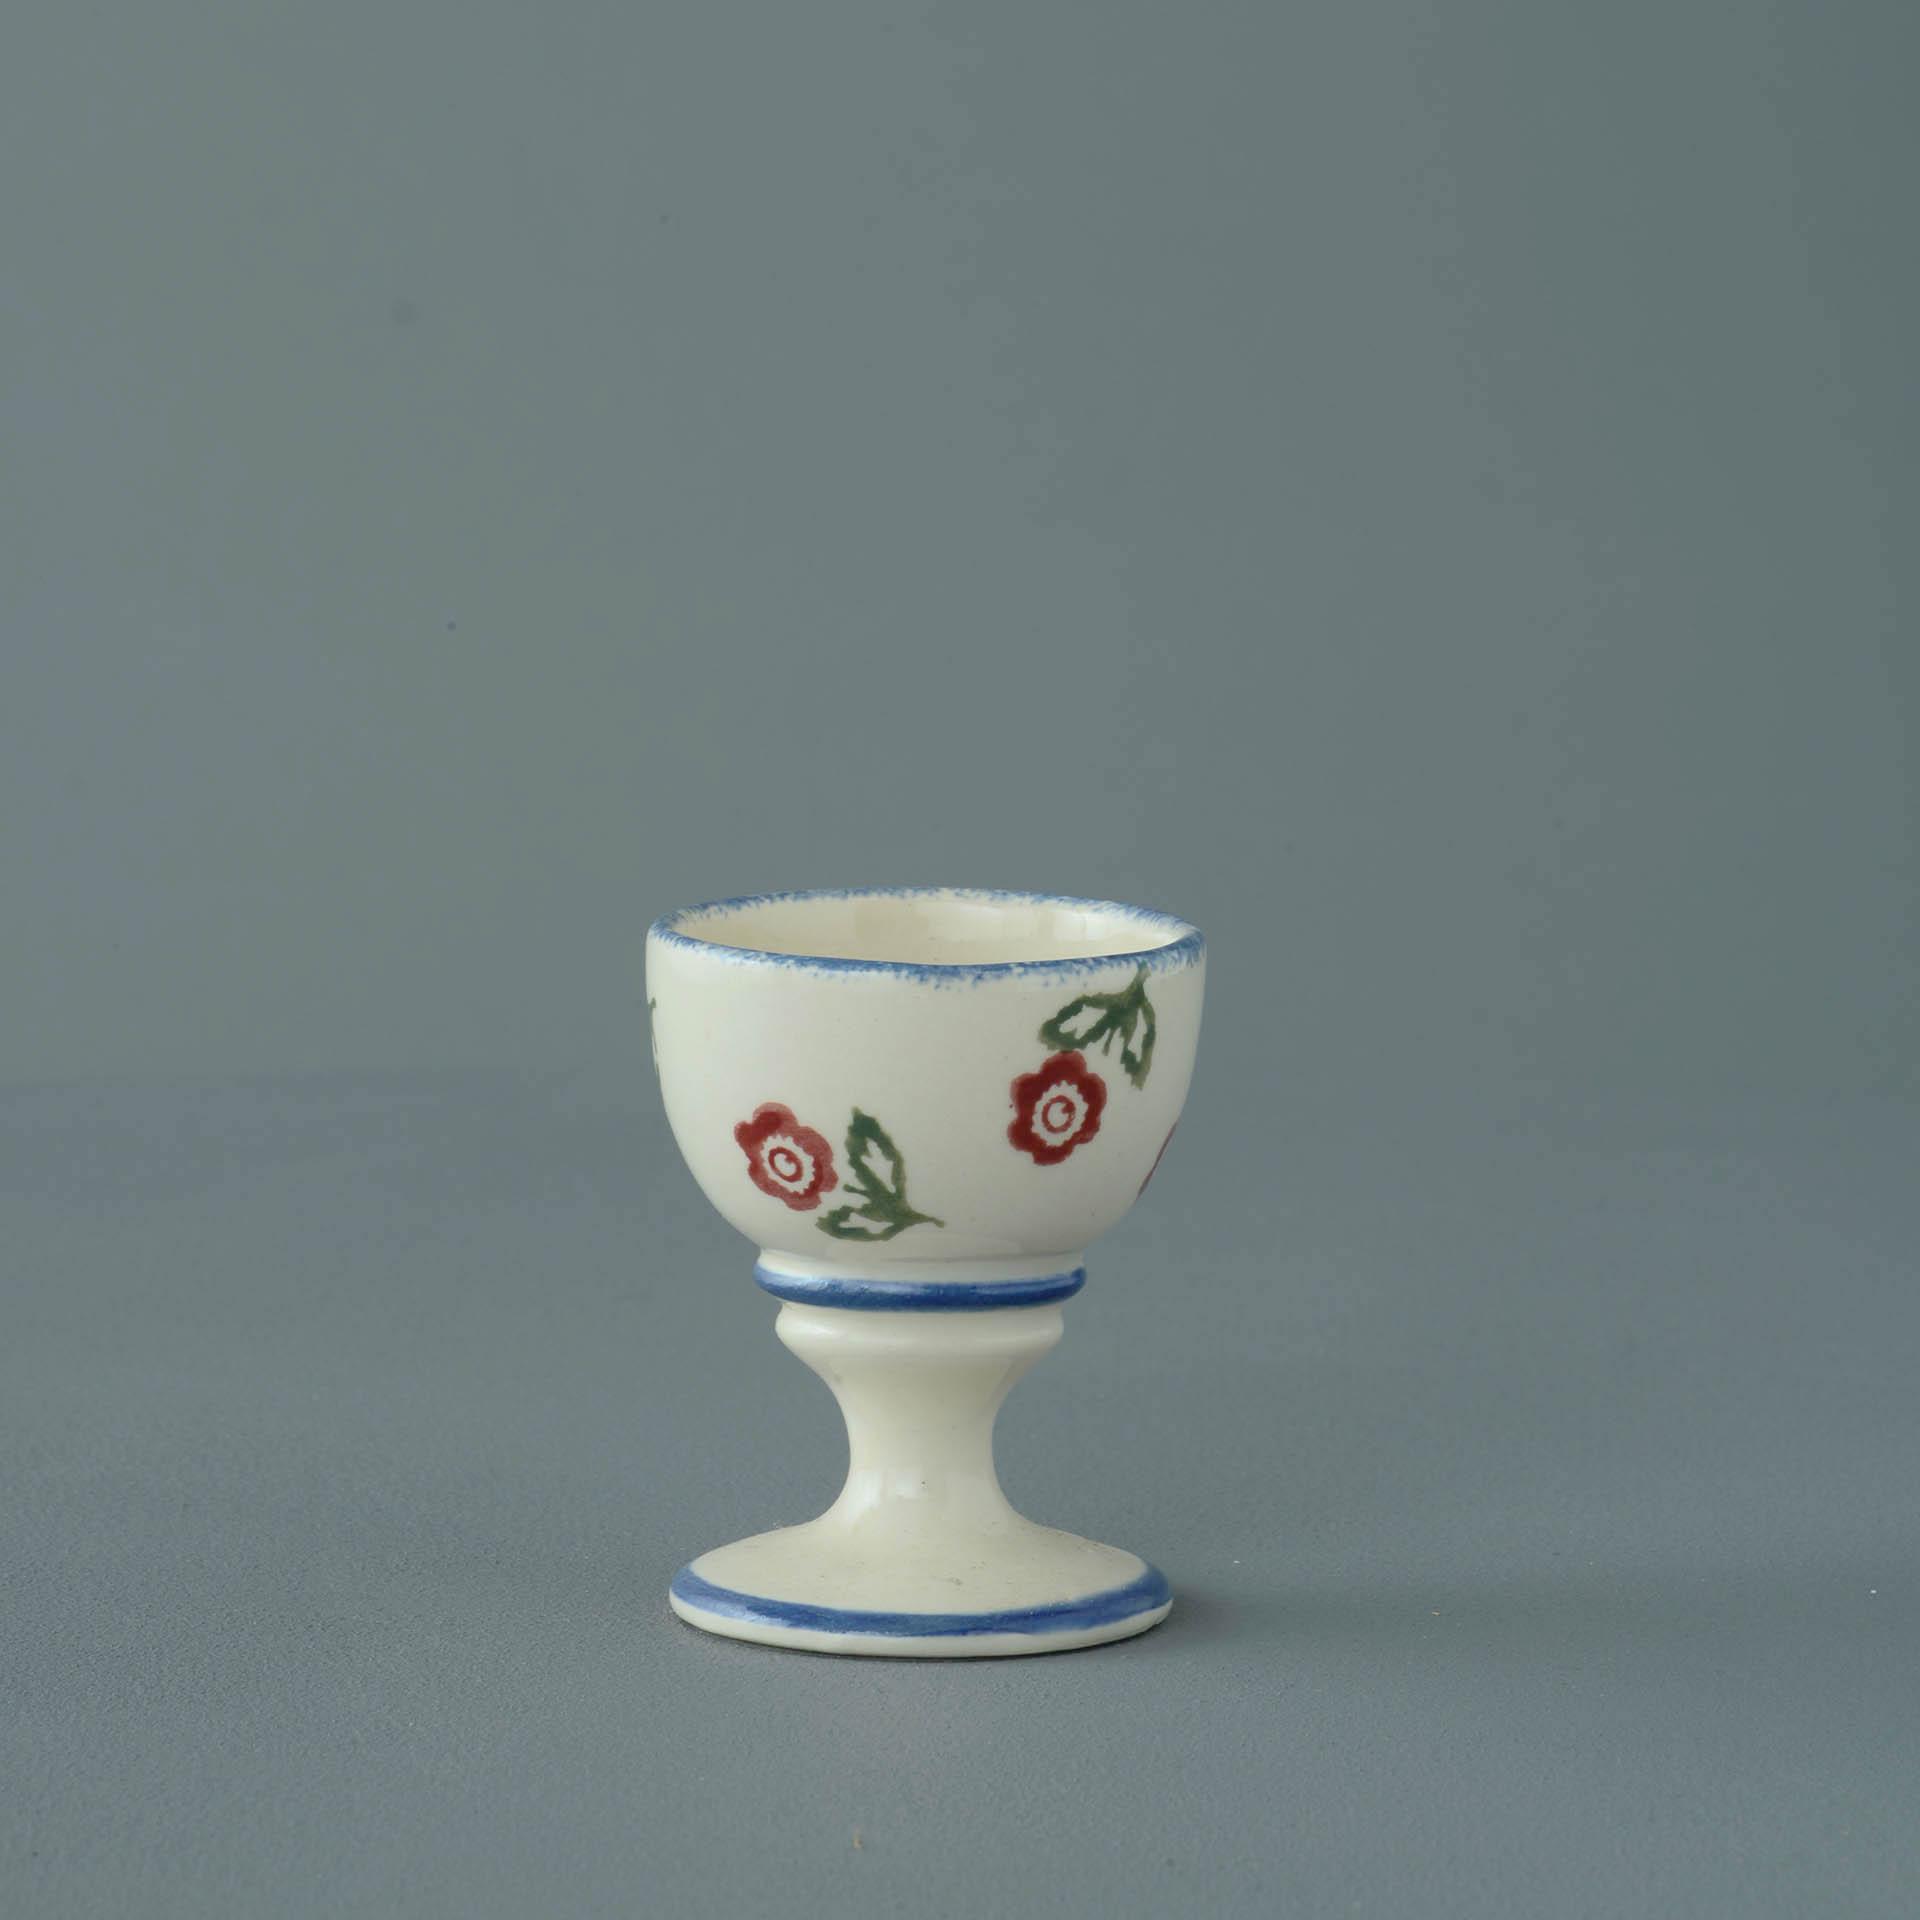 Scattered Rose Egg cup 6.3 x 5.2cm